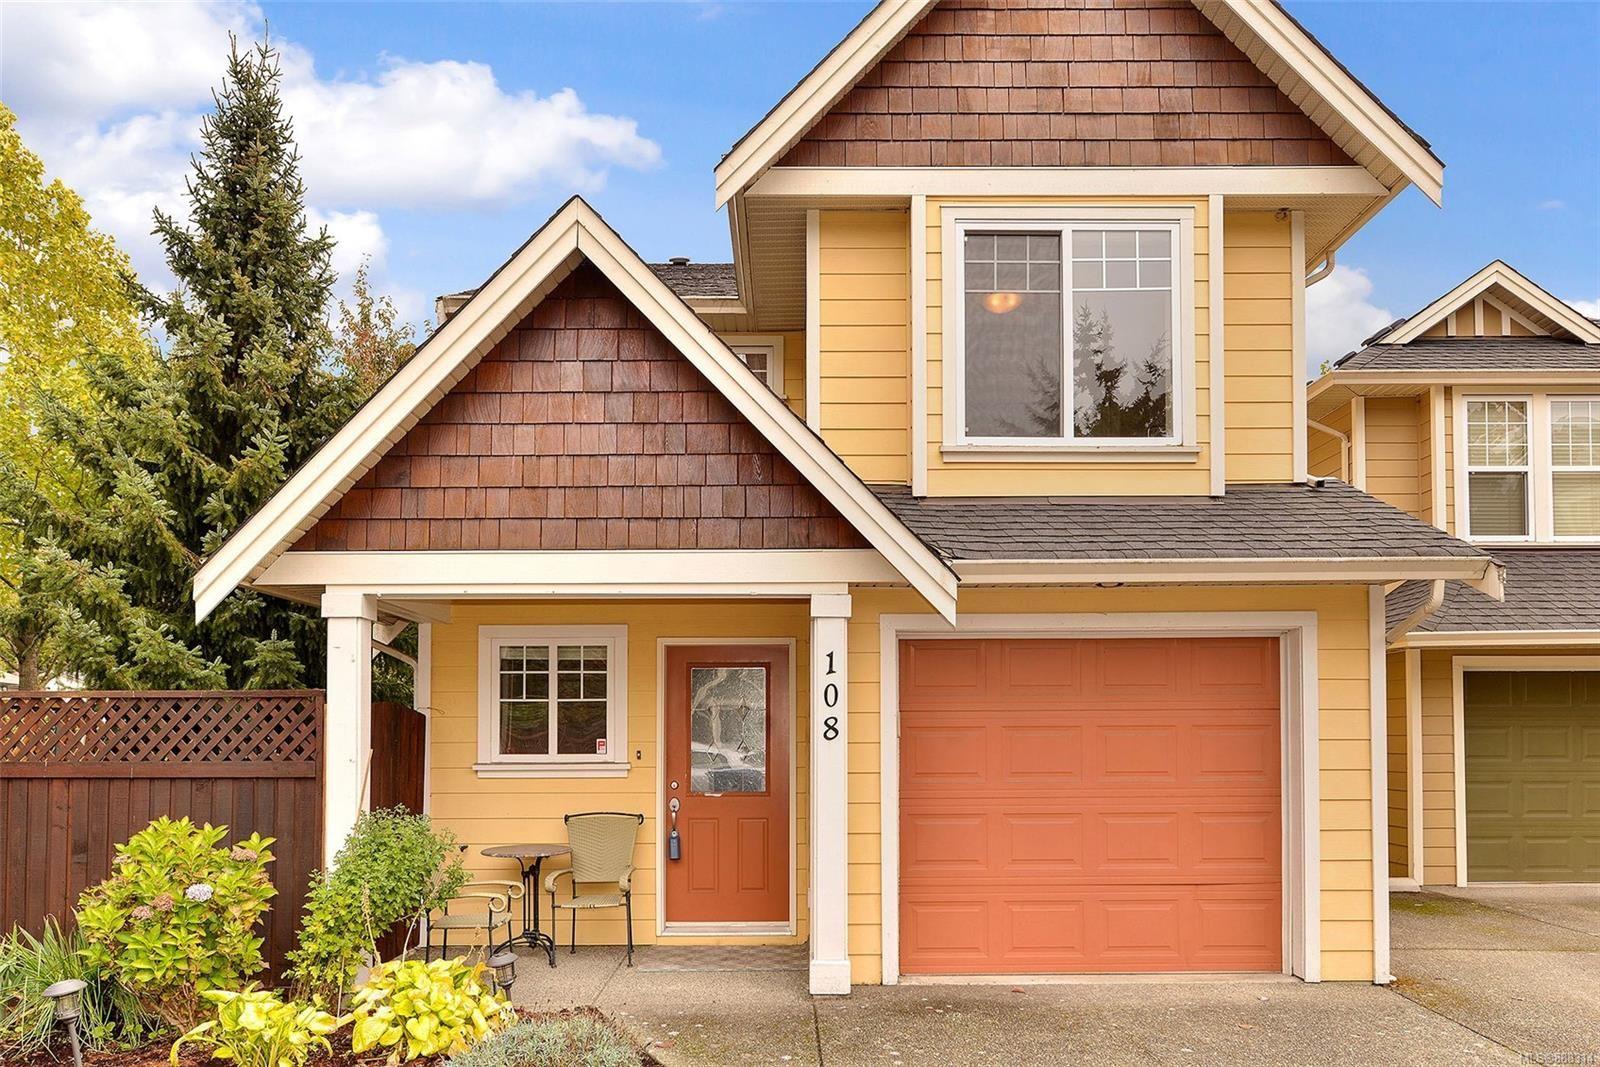 Main Photo: 108 724 LARKHALL Rd in : La Langford Proper House for sale (Langford)  : MLS®# 888314